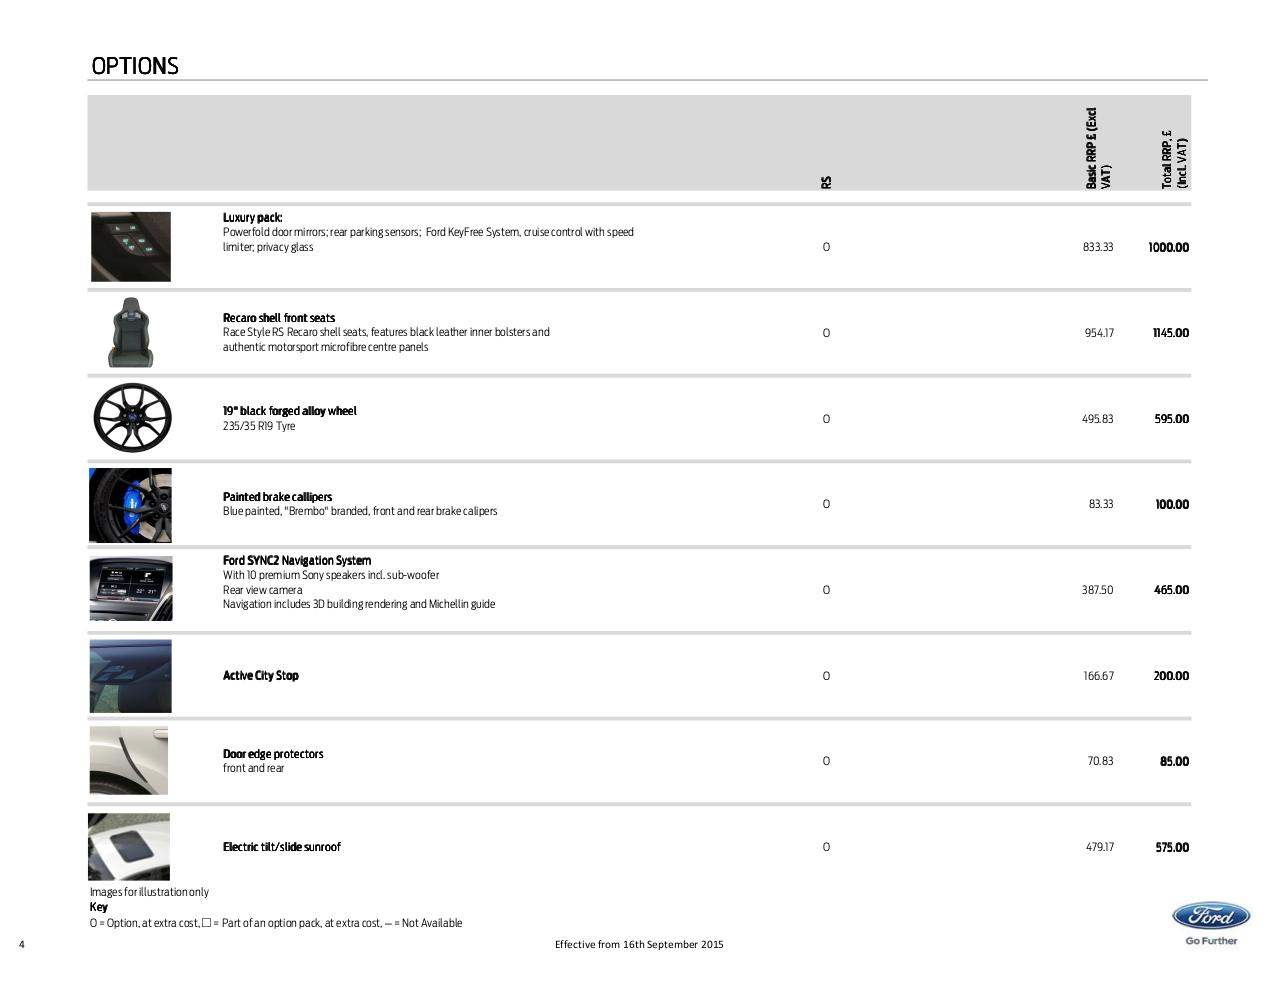 2016MY Focus RS Price List 16th Sep 2015 Customer.xls by saravi23 ...